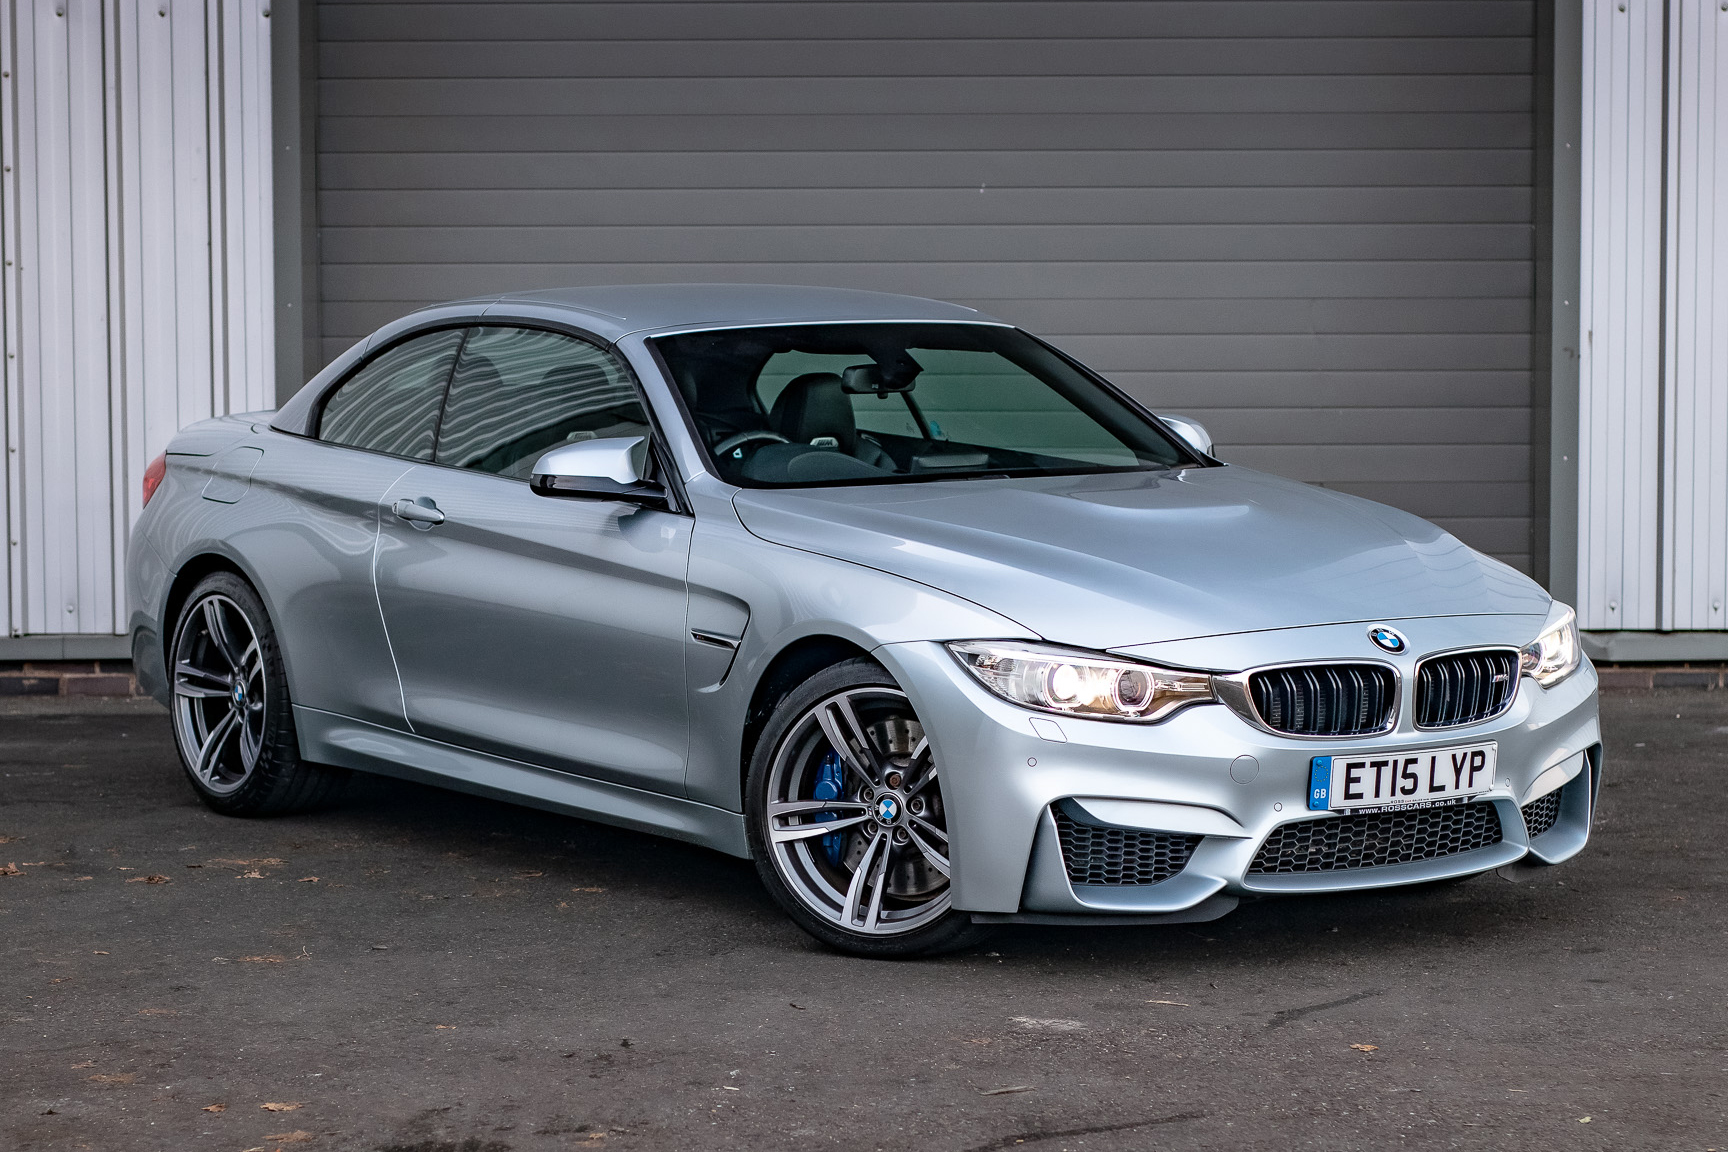 2015 BMW M4 CONVERTIBLE - MANUAL